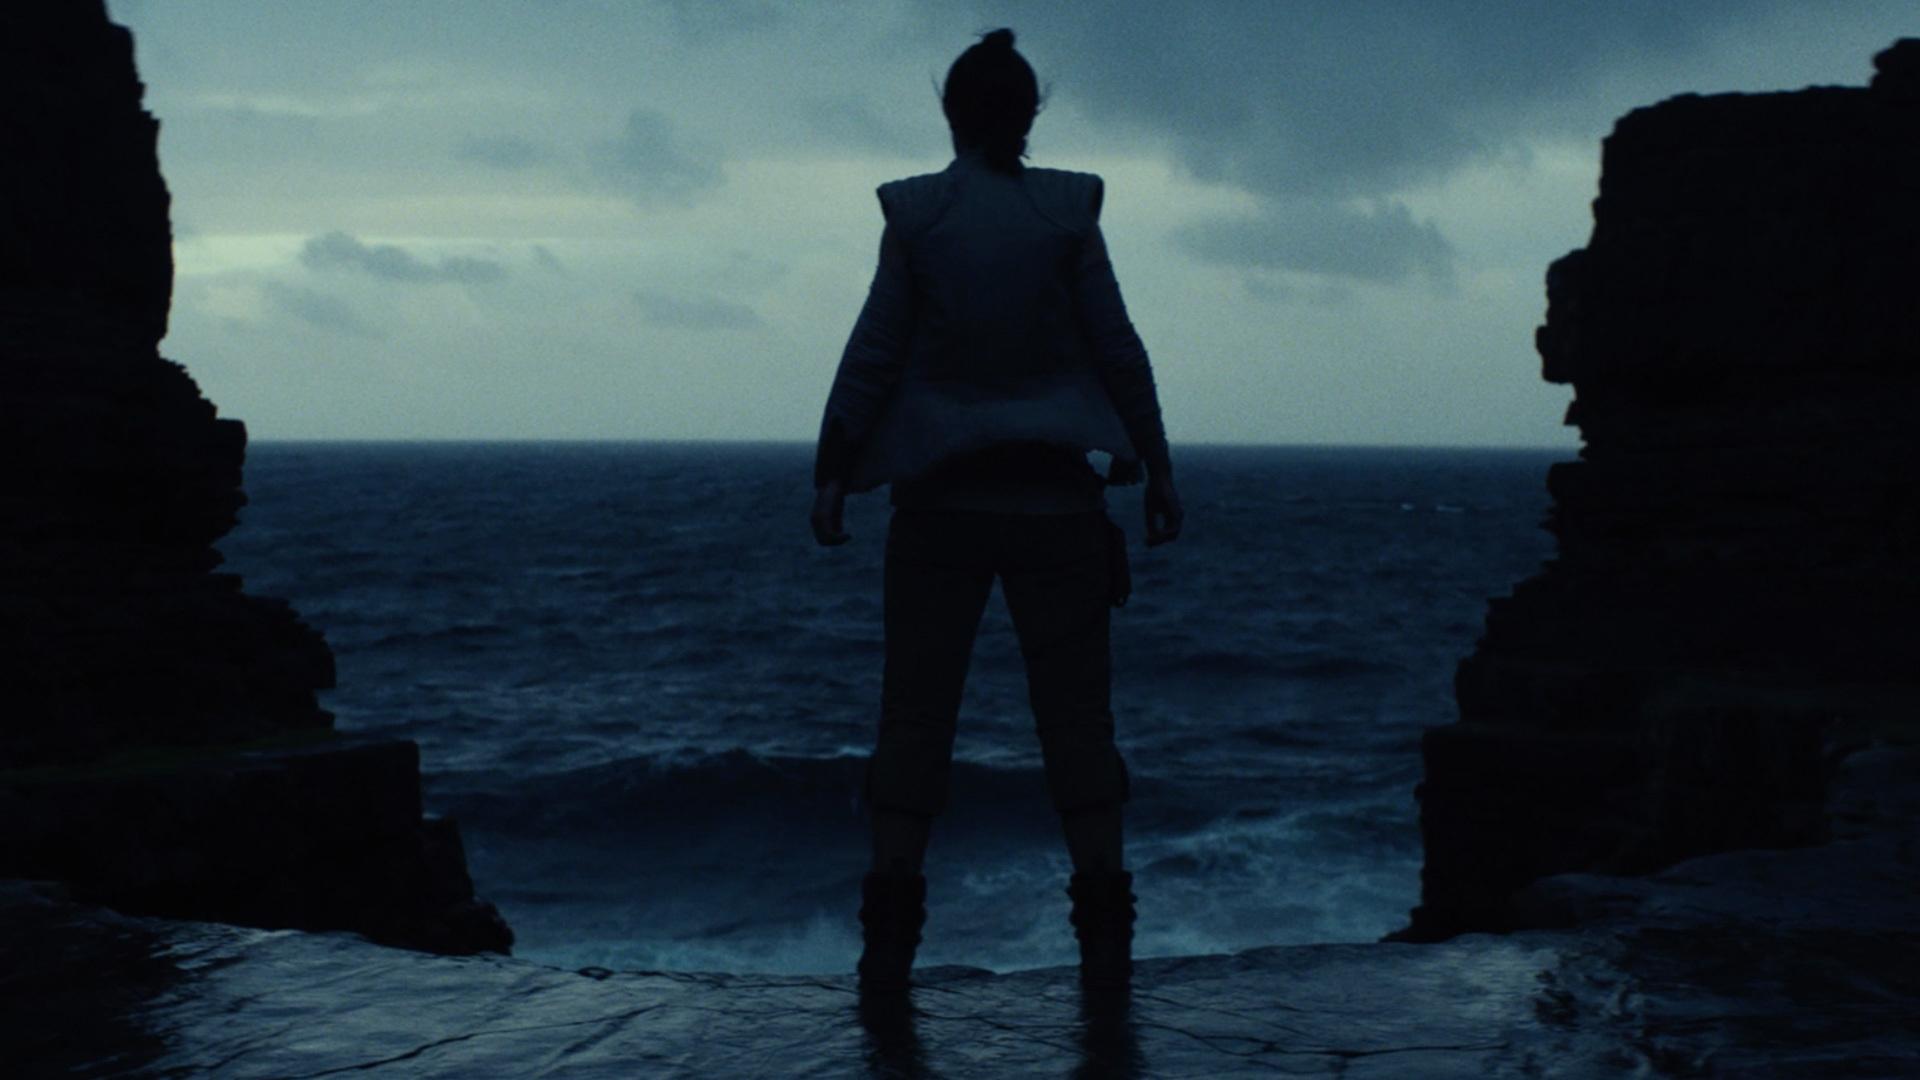 rian-johnson-says-star-wars-the-last-jedi-trailers-do-not-misrepresent-the-film-social.jpeg